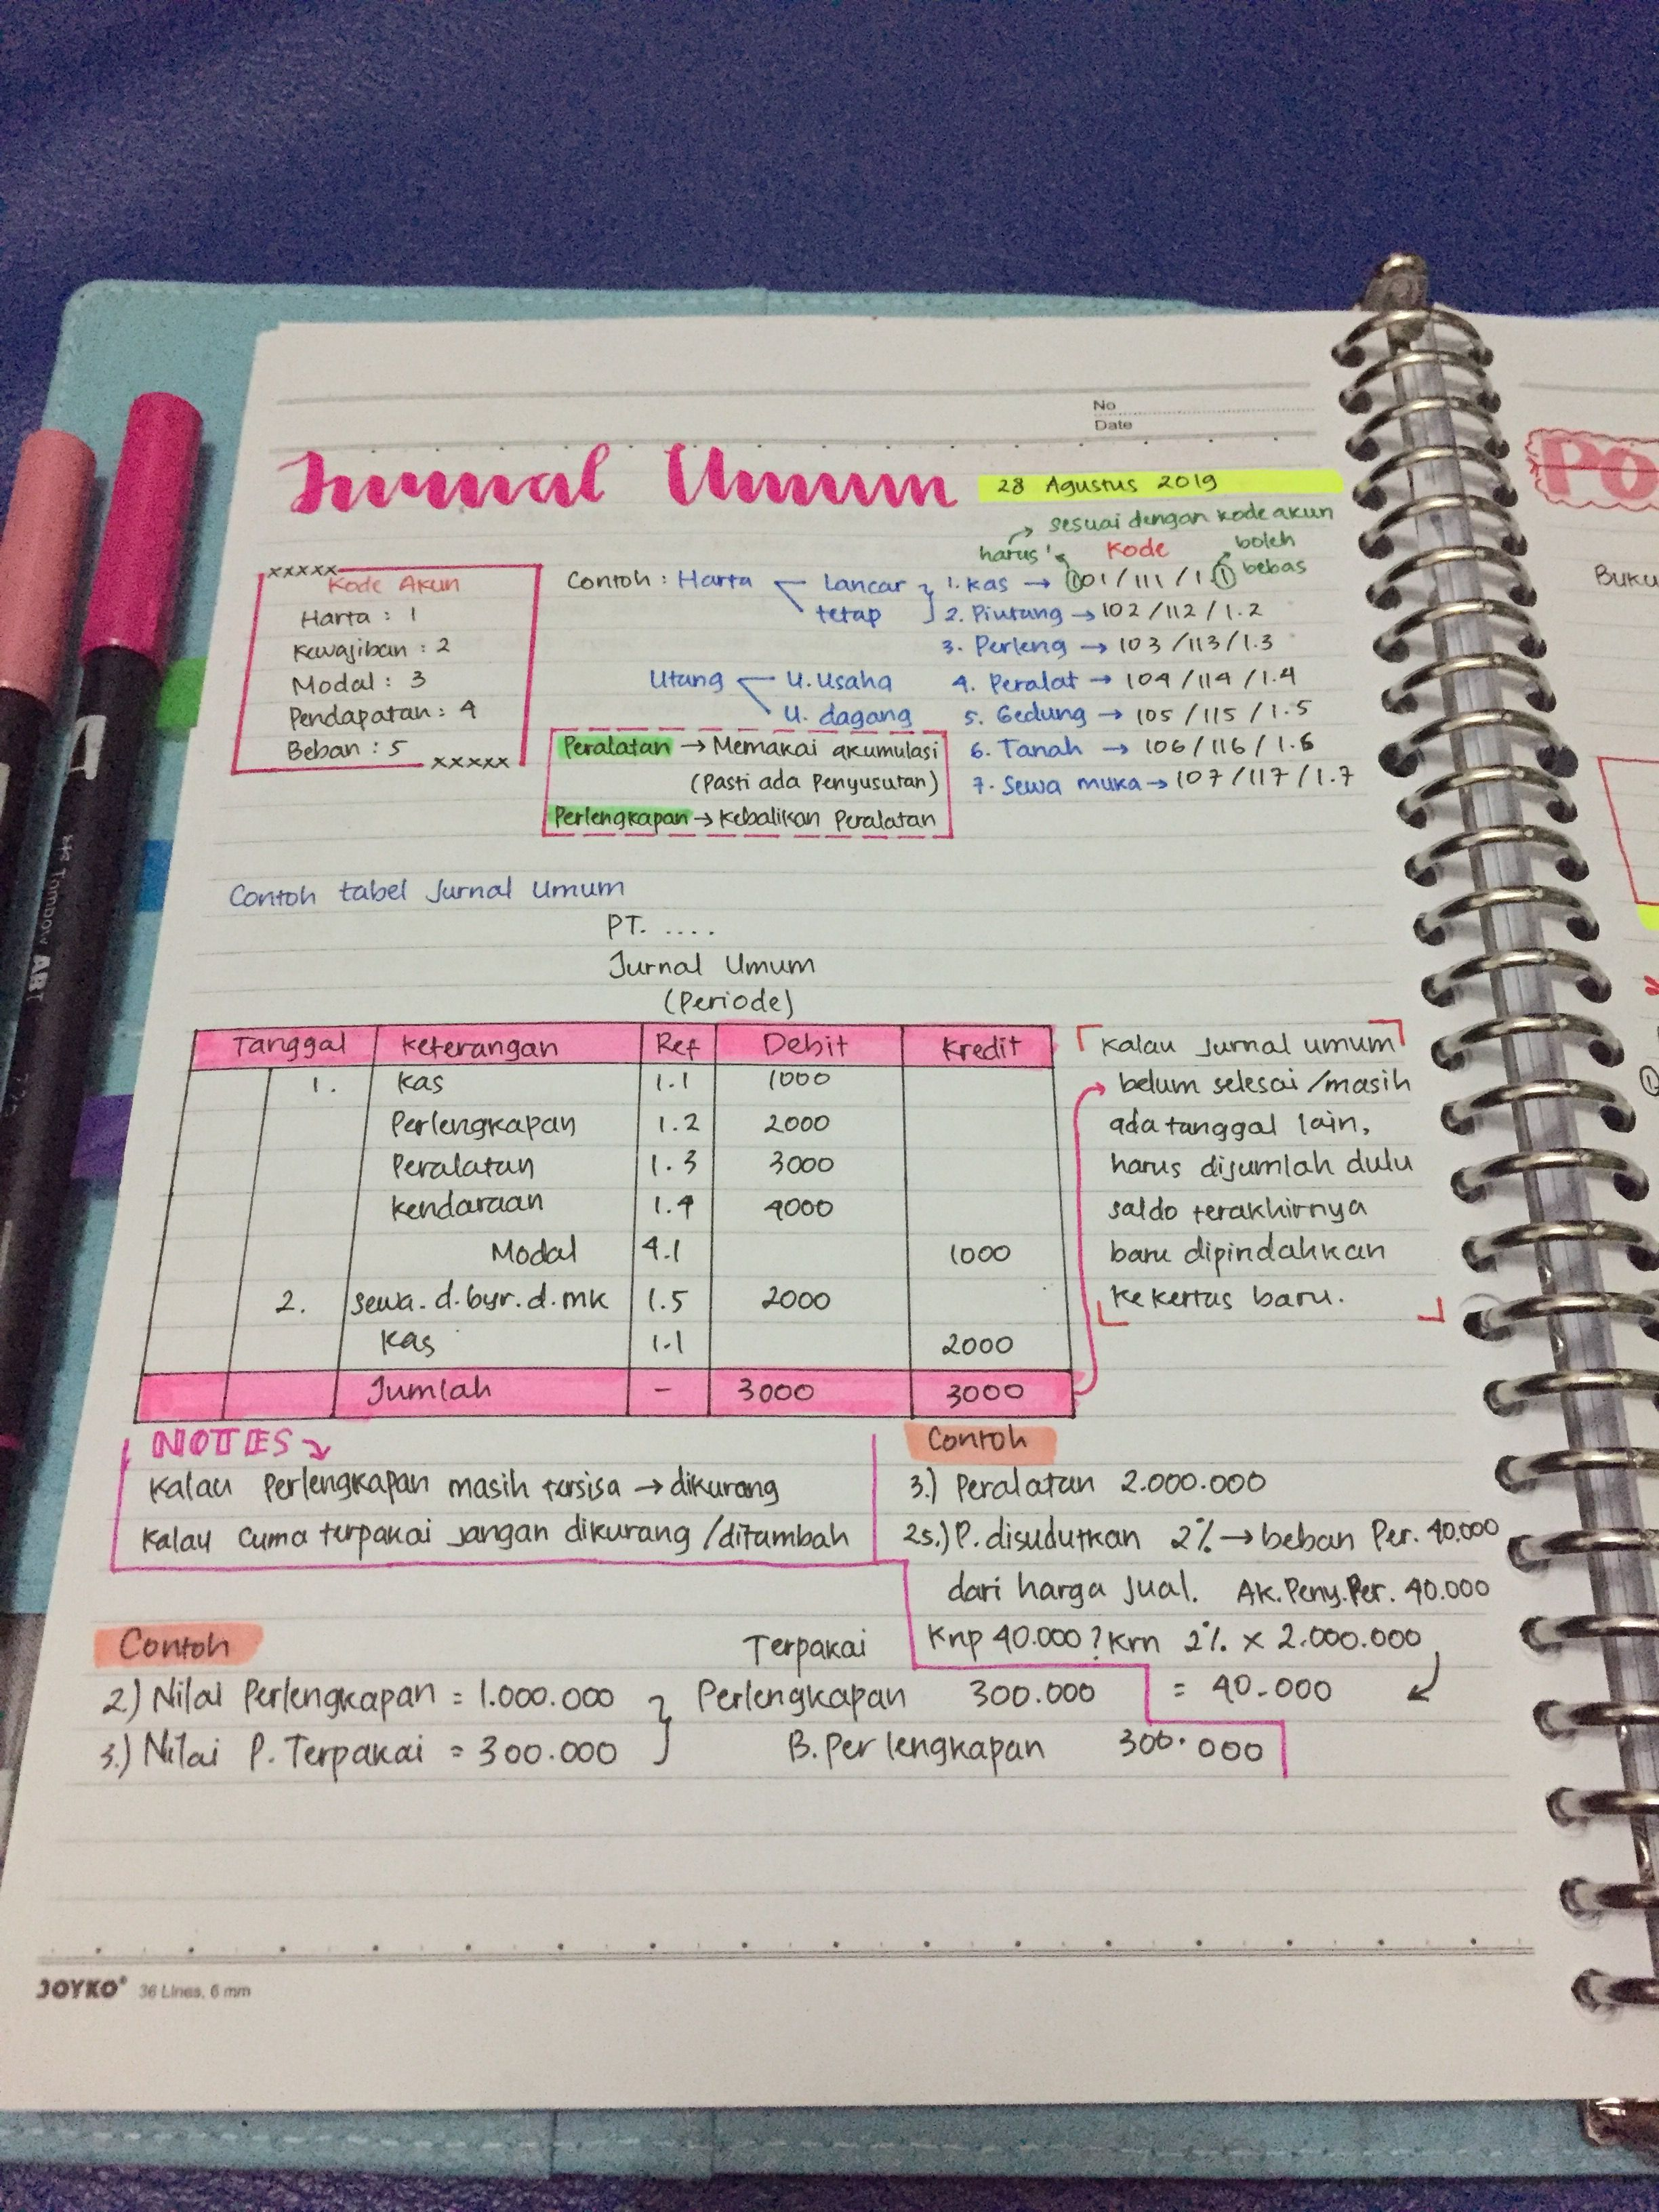 Jurnal Umum Buku Pelajaran Buku Catatan Penulisan Kreatif